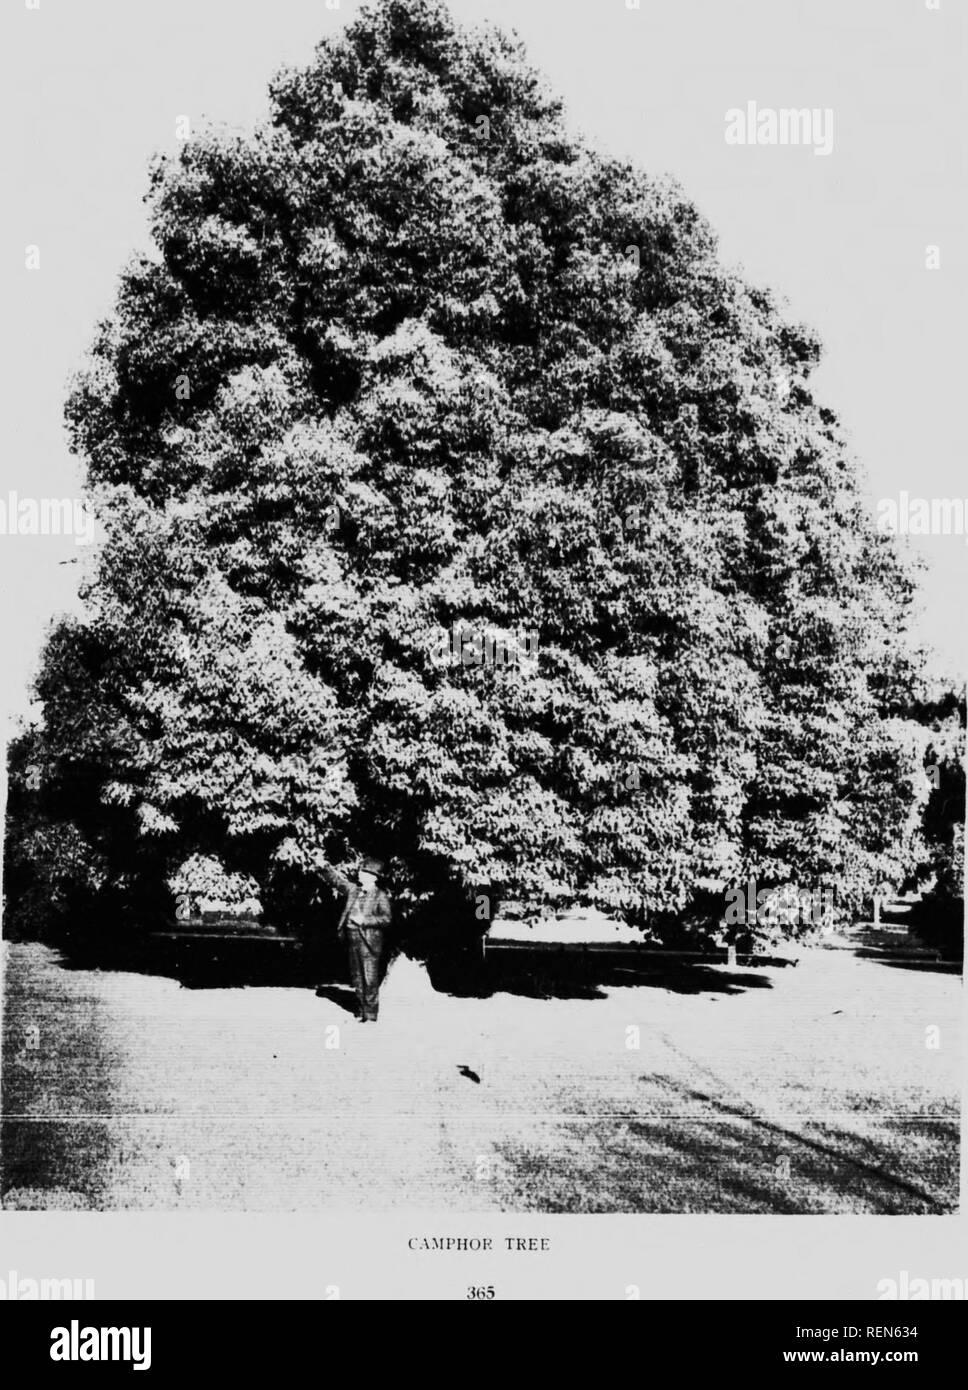 L Herbier Du Midi Produits Naturels llir black and white stock photos & images - alamy